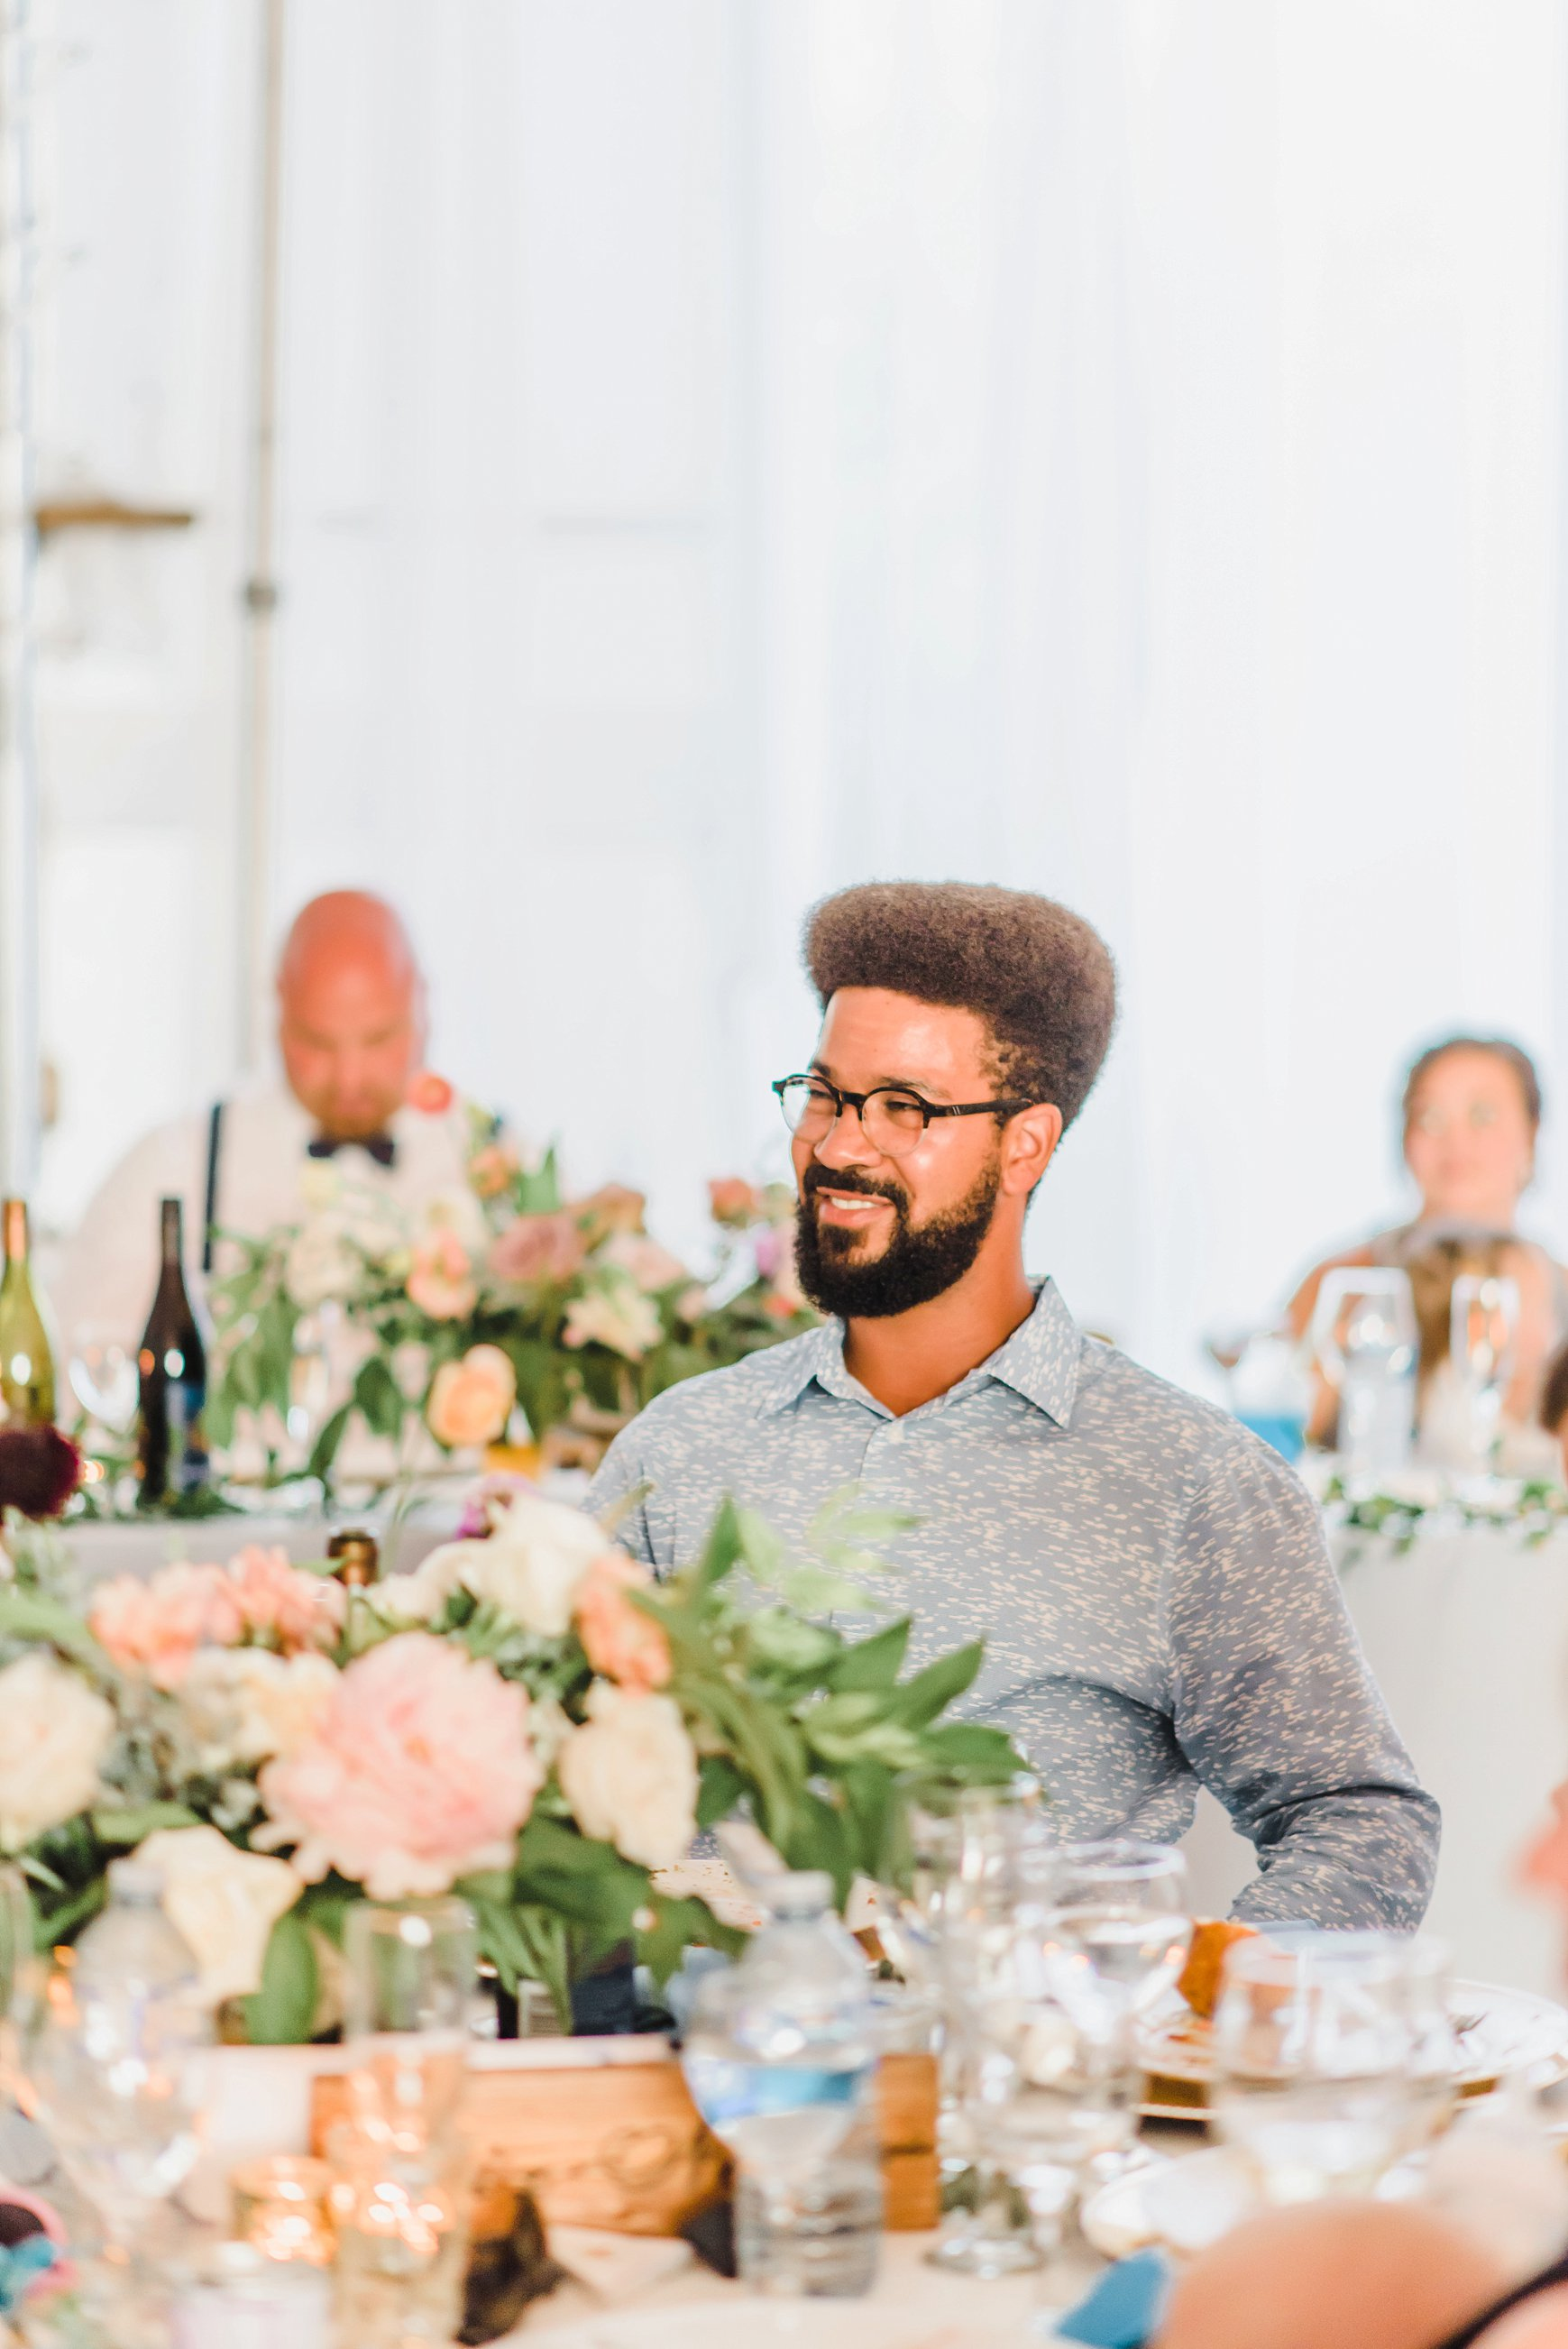 light airy indie fine art ottawa wedding photographer | Ali and Batoul Photography_0436.jpg